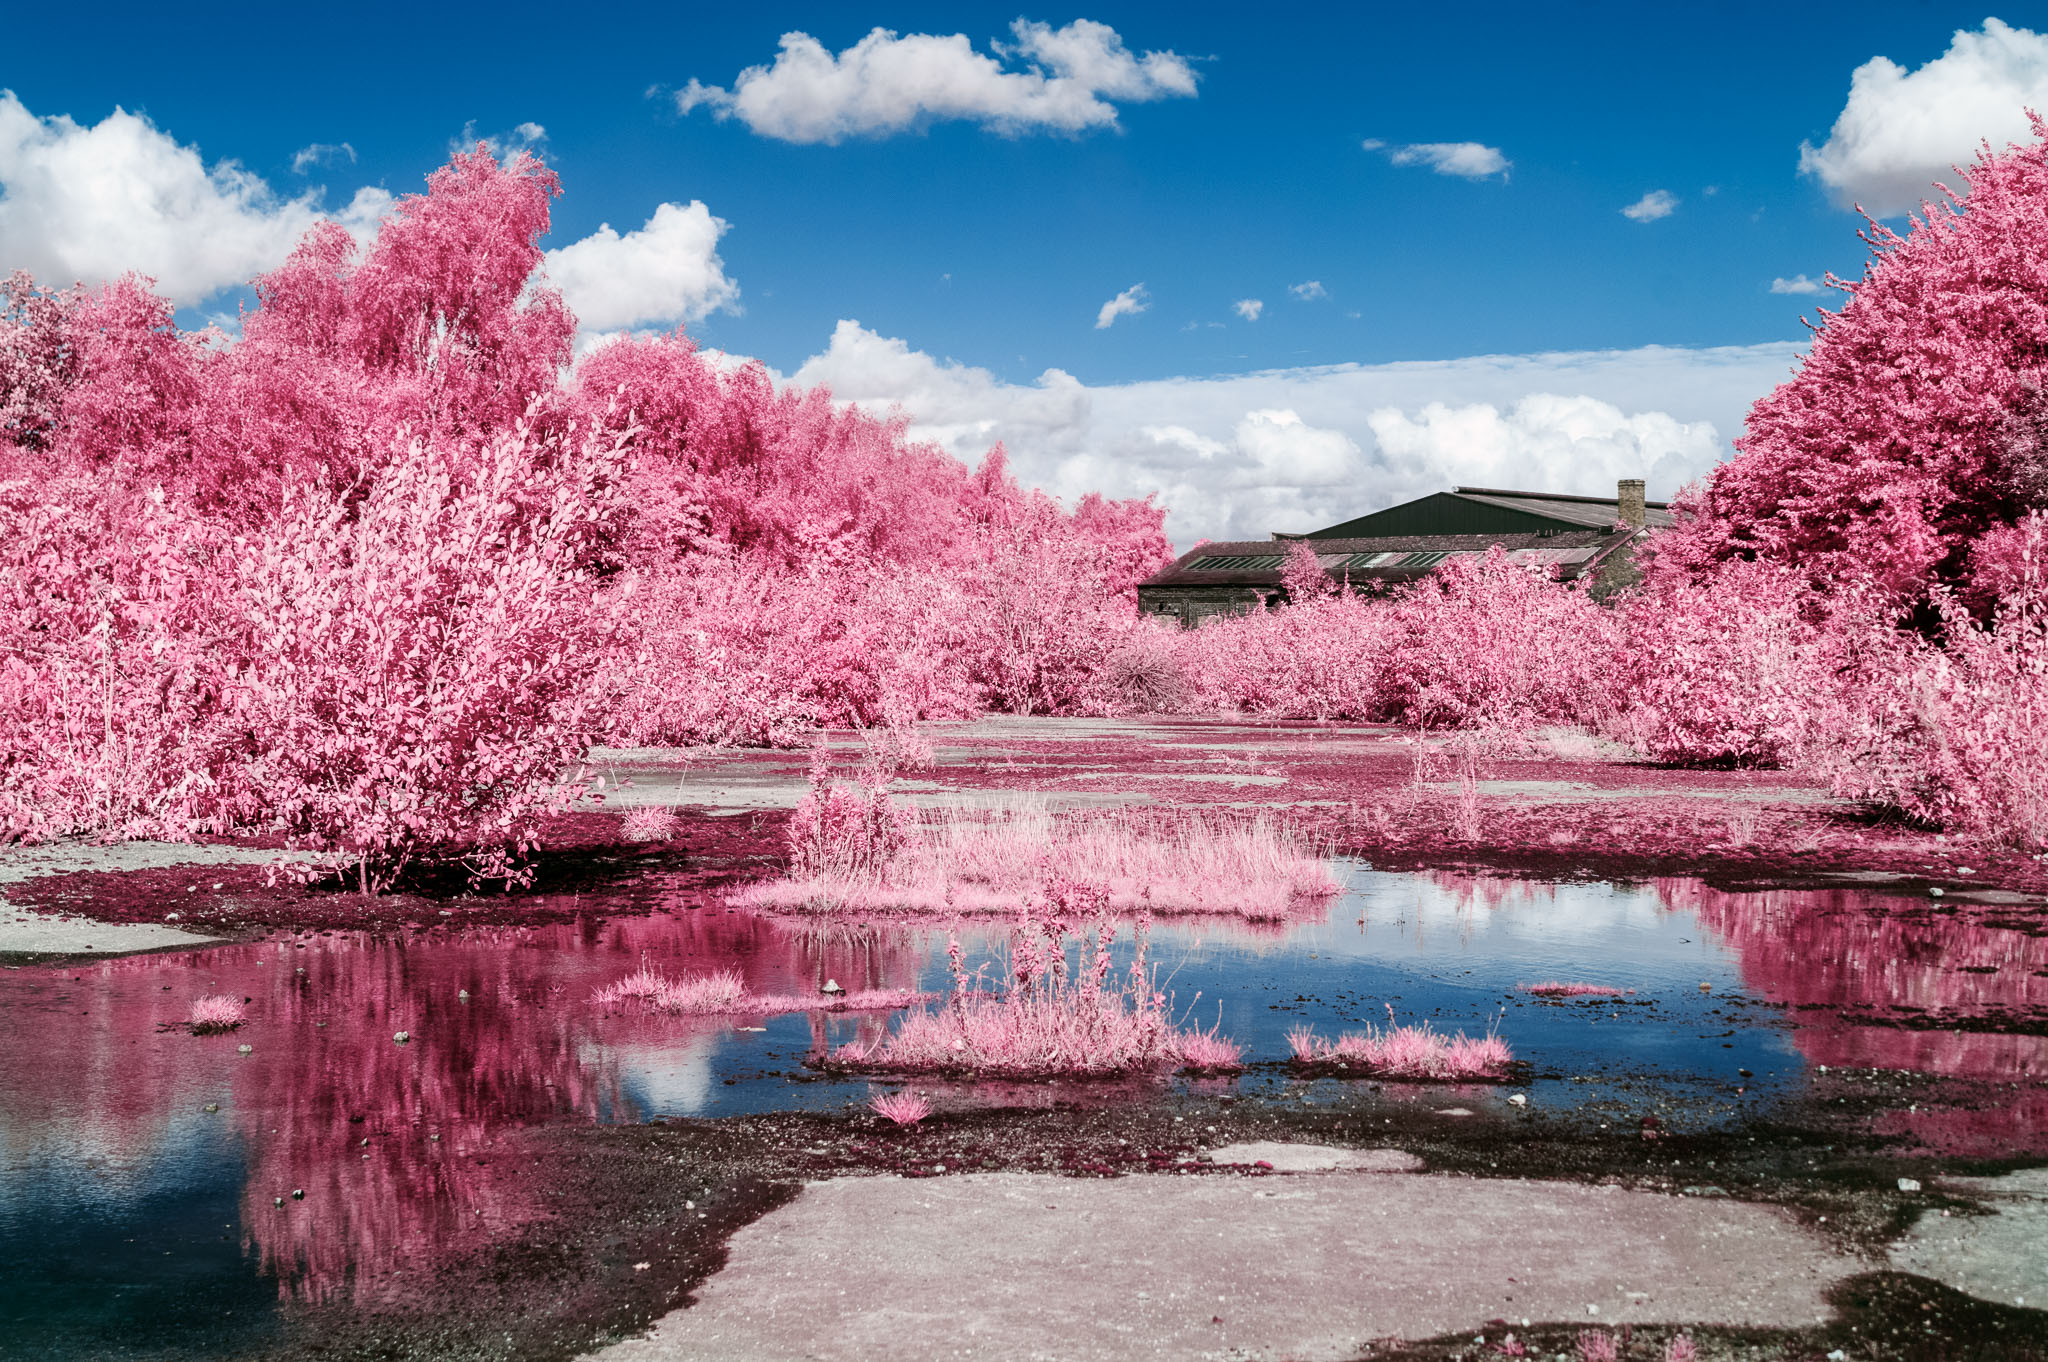 Kodak EIR Colour Infrared, Edgelands, Wasteland, Warehouse, Water ©Jonny Sutton